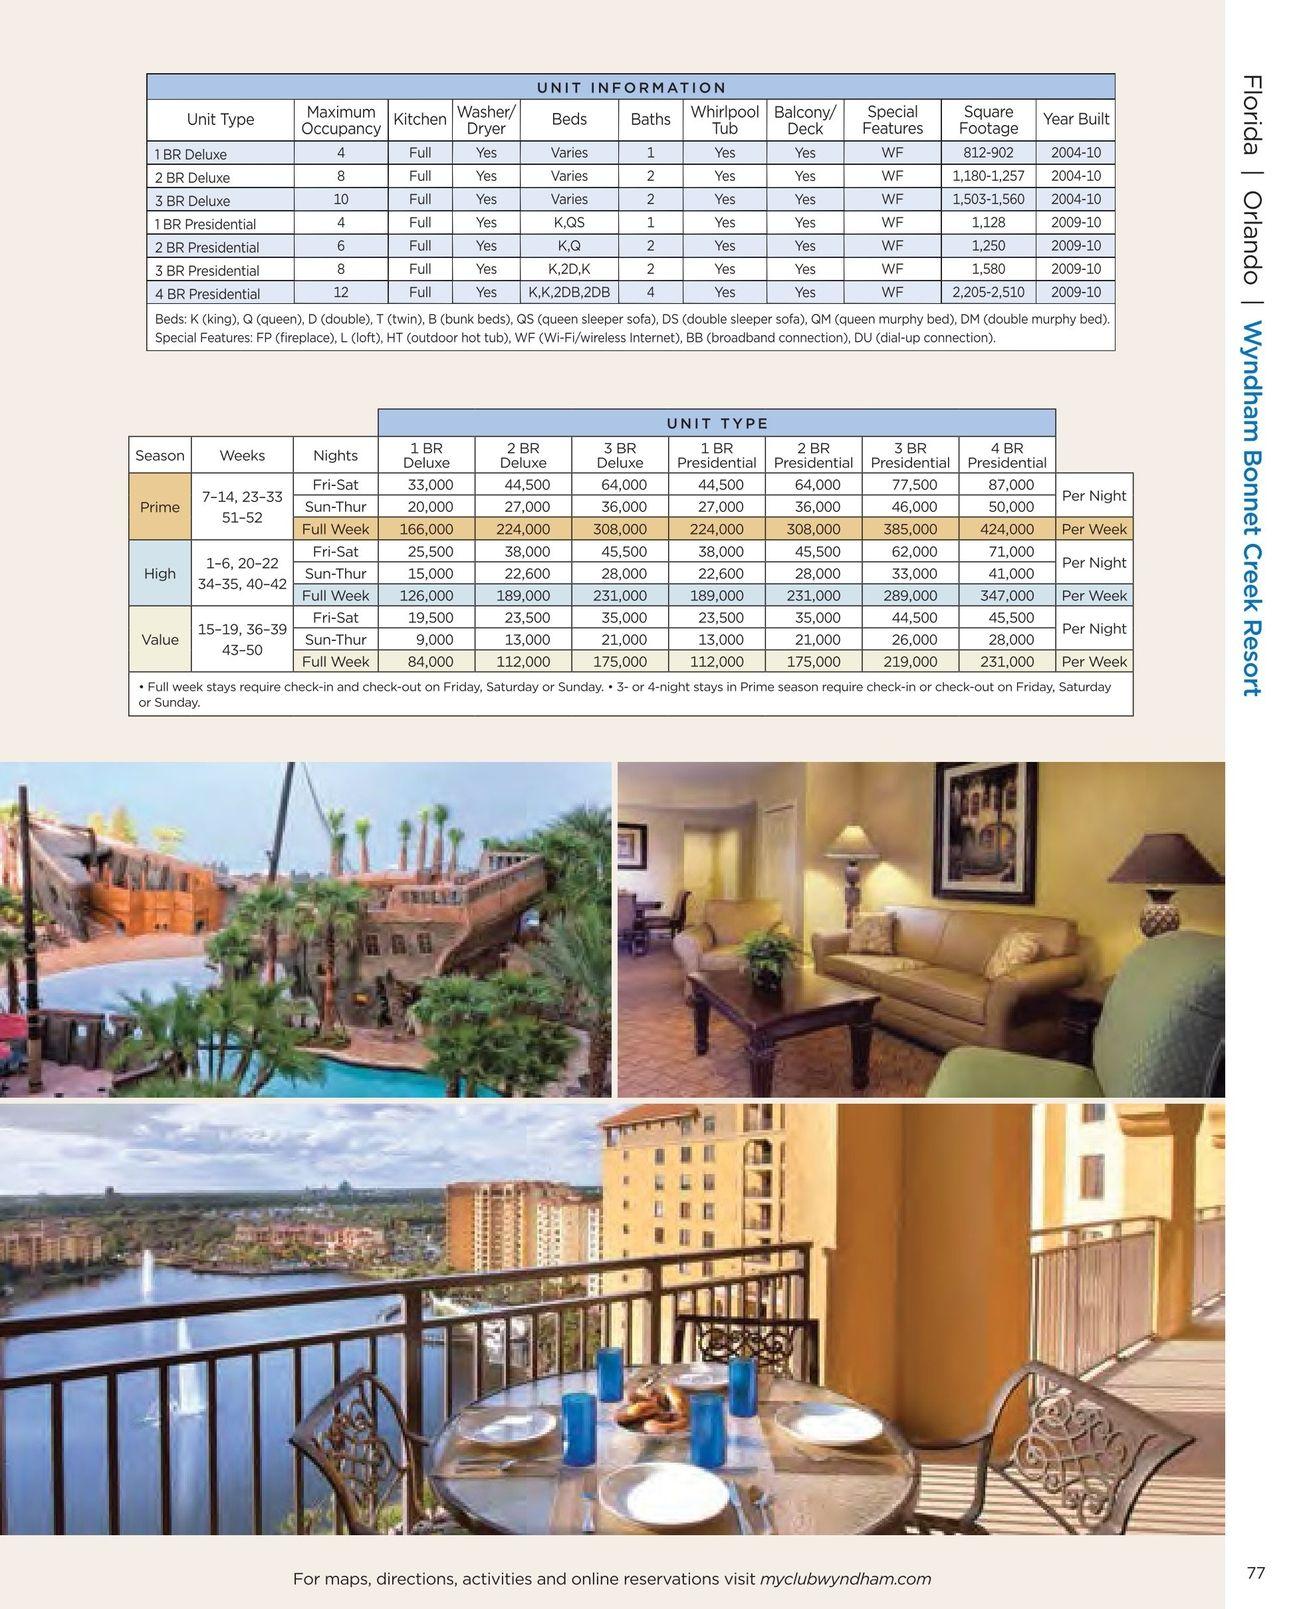 Wyndham Bonnet Creek Orlando Point Chart Wyndham Vacation Resorts Bonnet Creek Orlando Wyndham Bonnet Creek Orlando